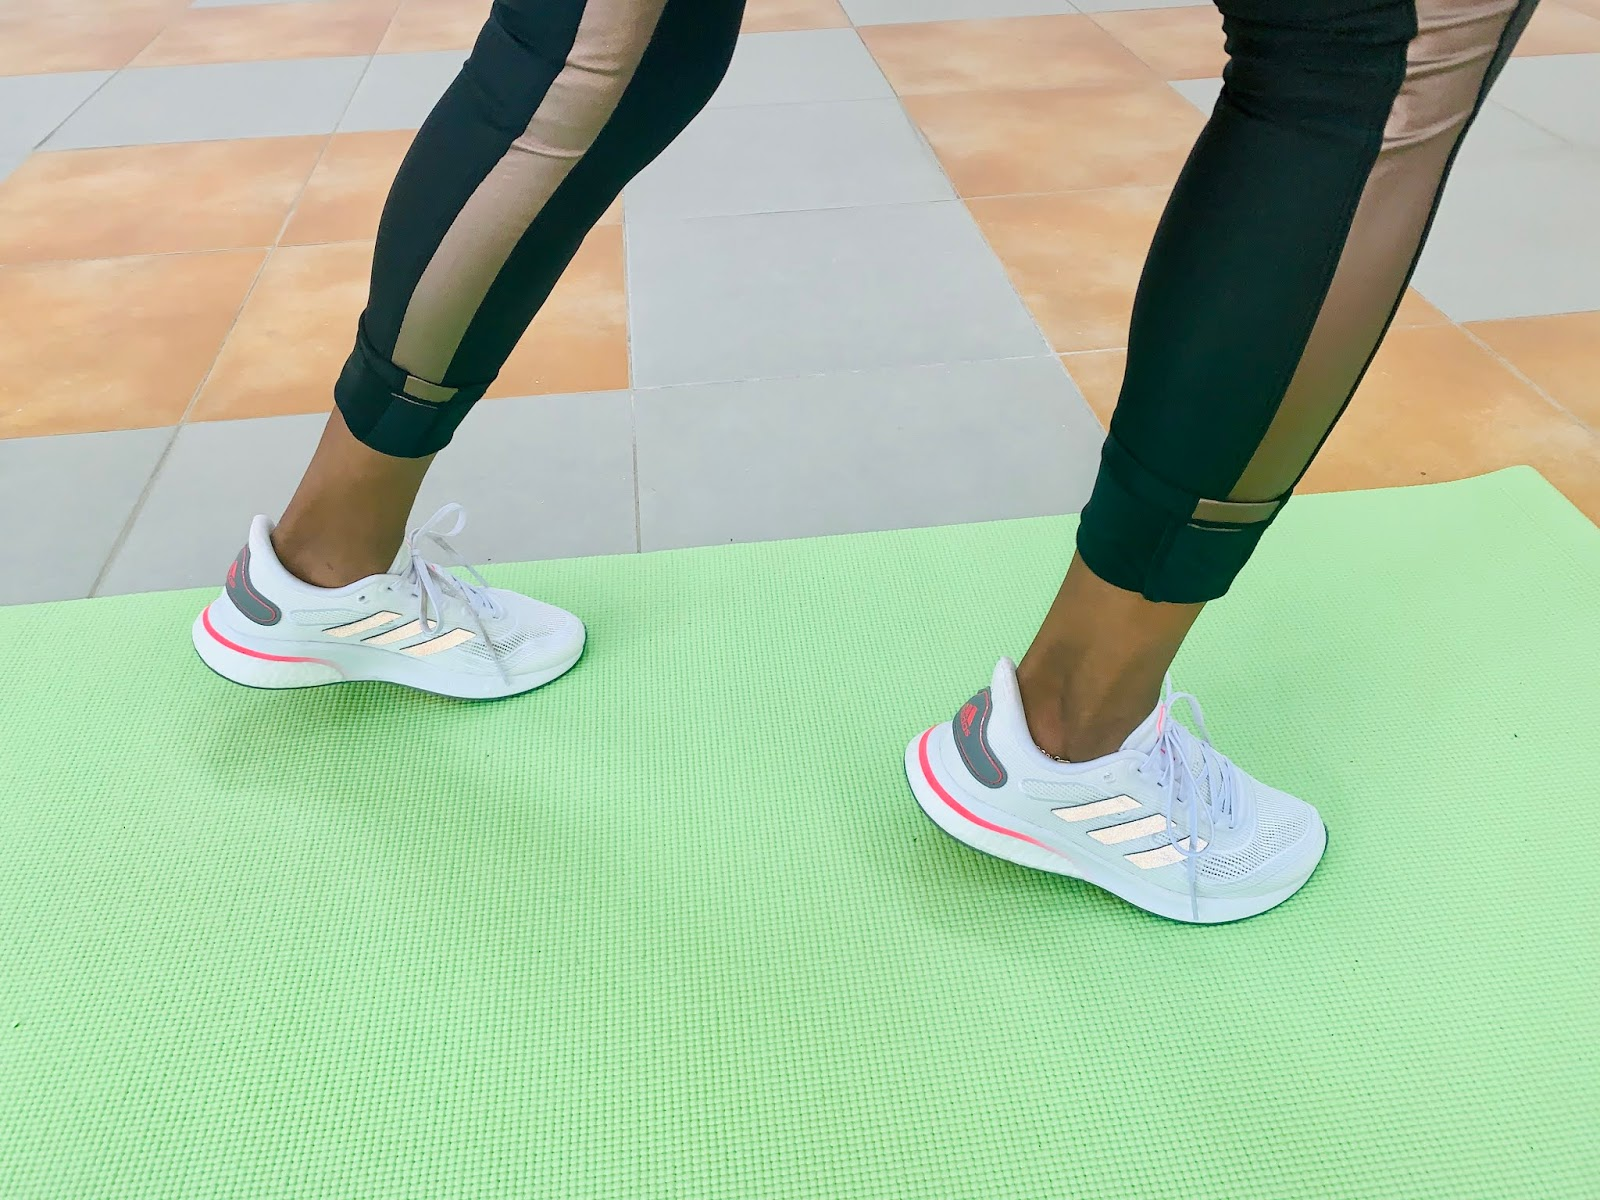 Espejismo ayudar Finanzas  LaMoumous Fashion Blog: 5 reasons why I love my Adidas Supernova Running  Shoes